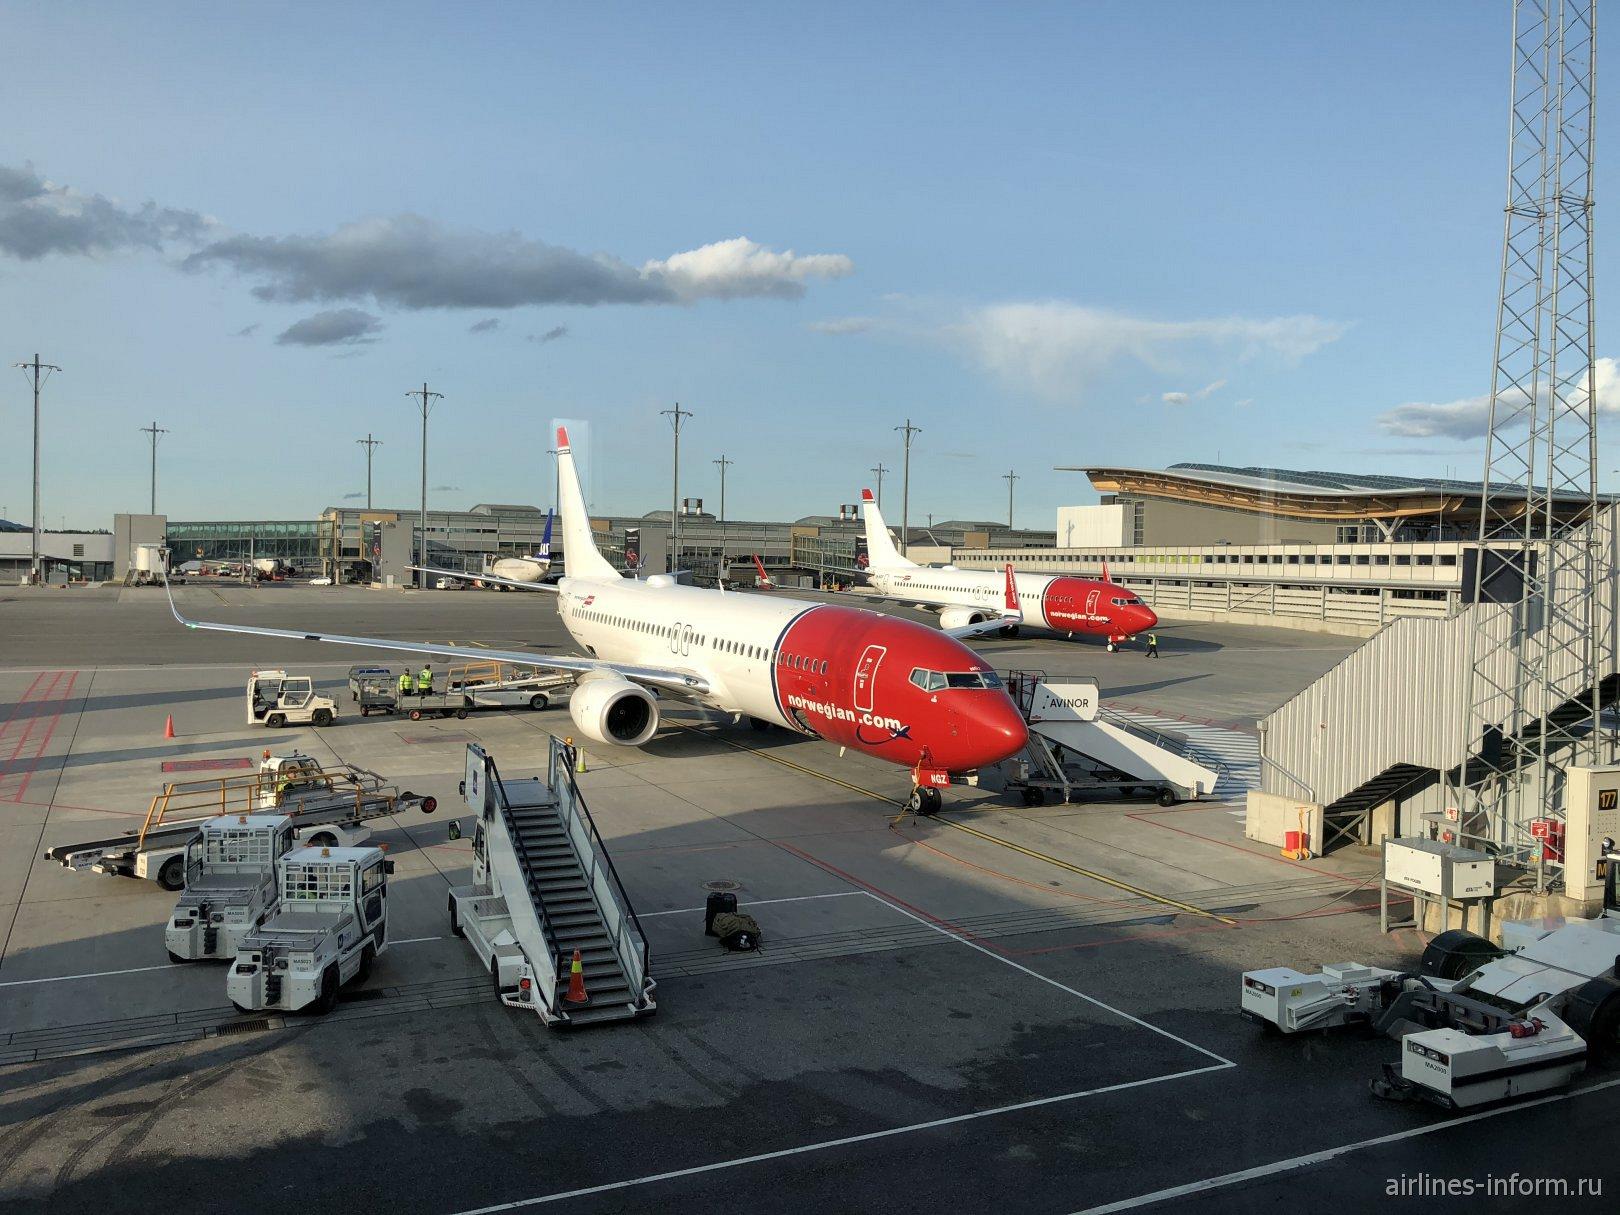 Самолеты Боинг-737-800 авиакомпании Norwegian в аэропорту Осло Гардермуэн